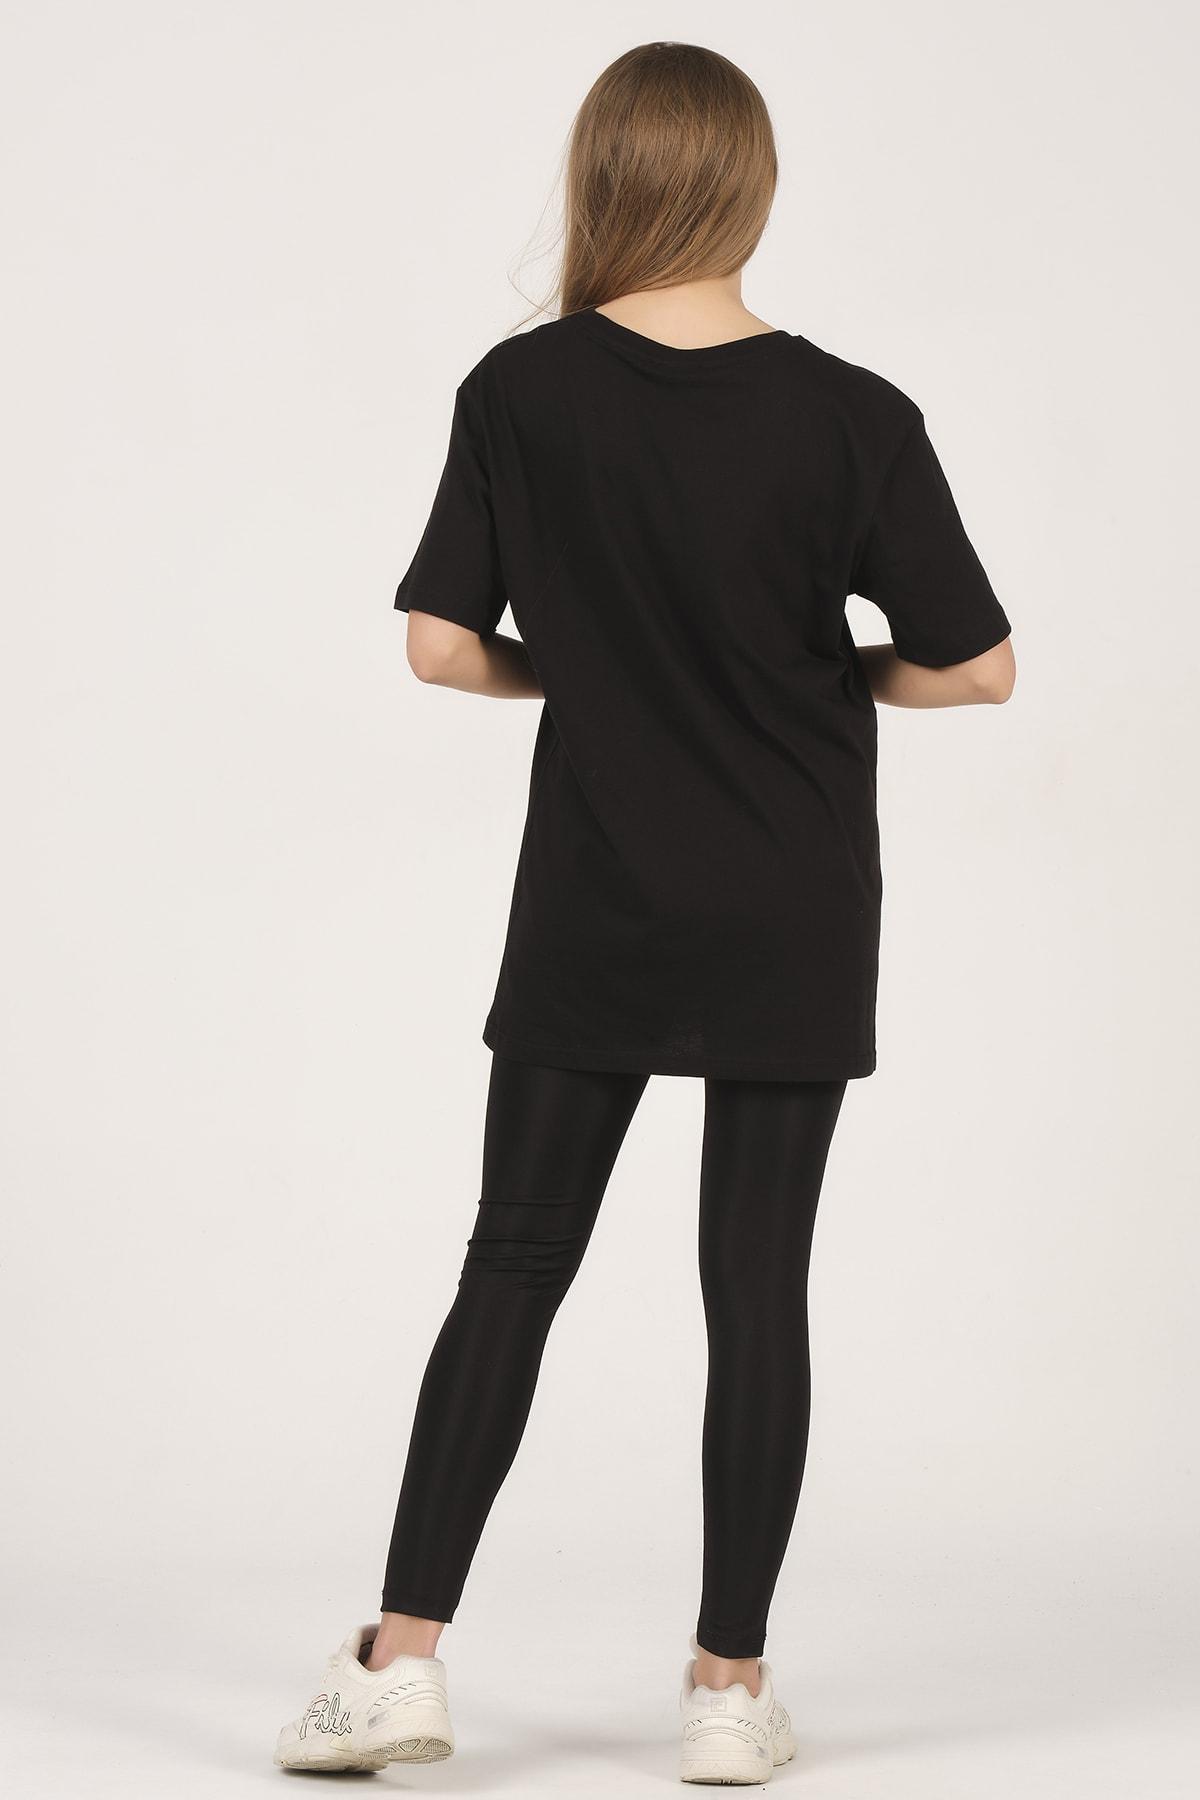 citadium Kadın Siyah Bisiklet Yaka Kısa Kollu Basic T-shirt %100 Pamuk 2